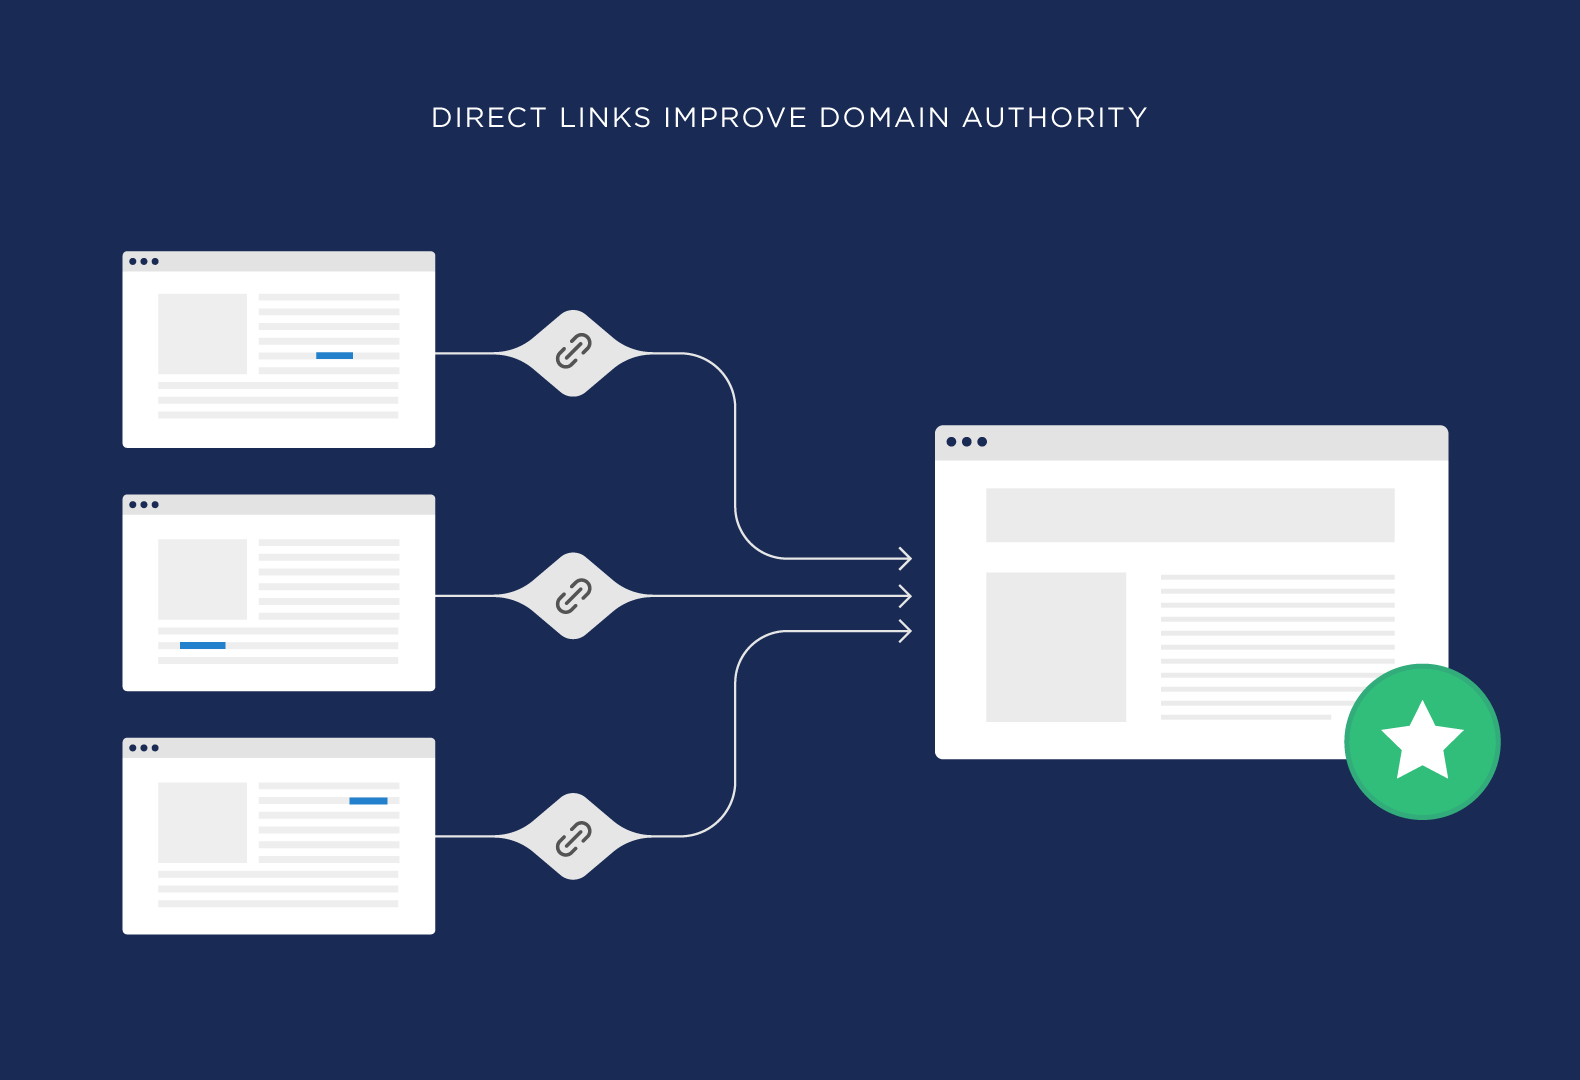 Direct links improve domain authority